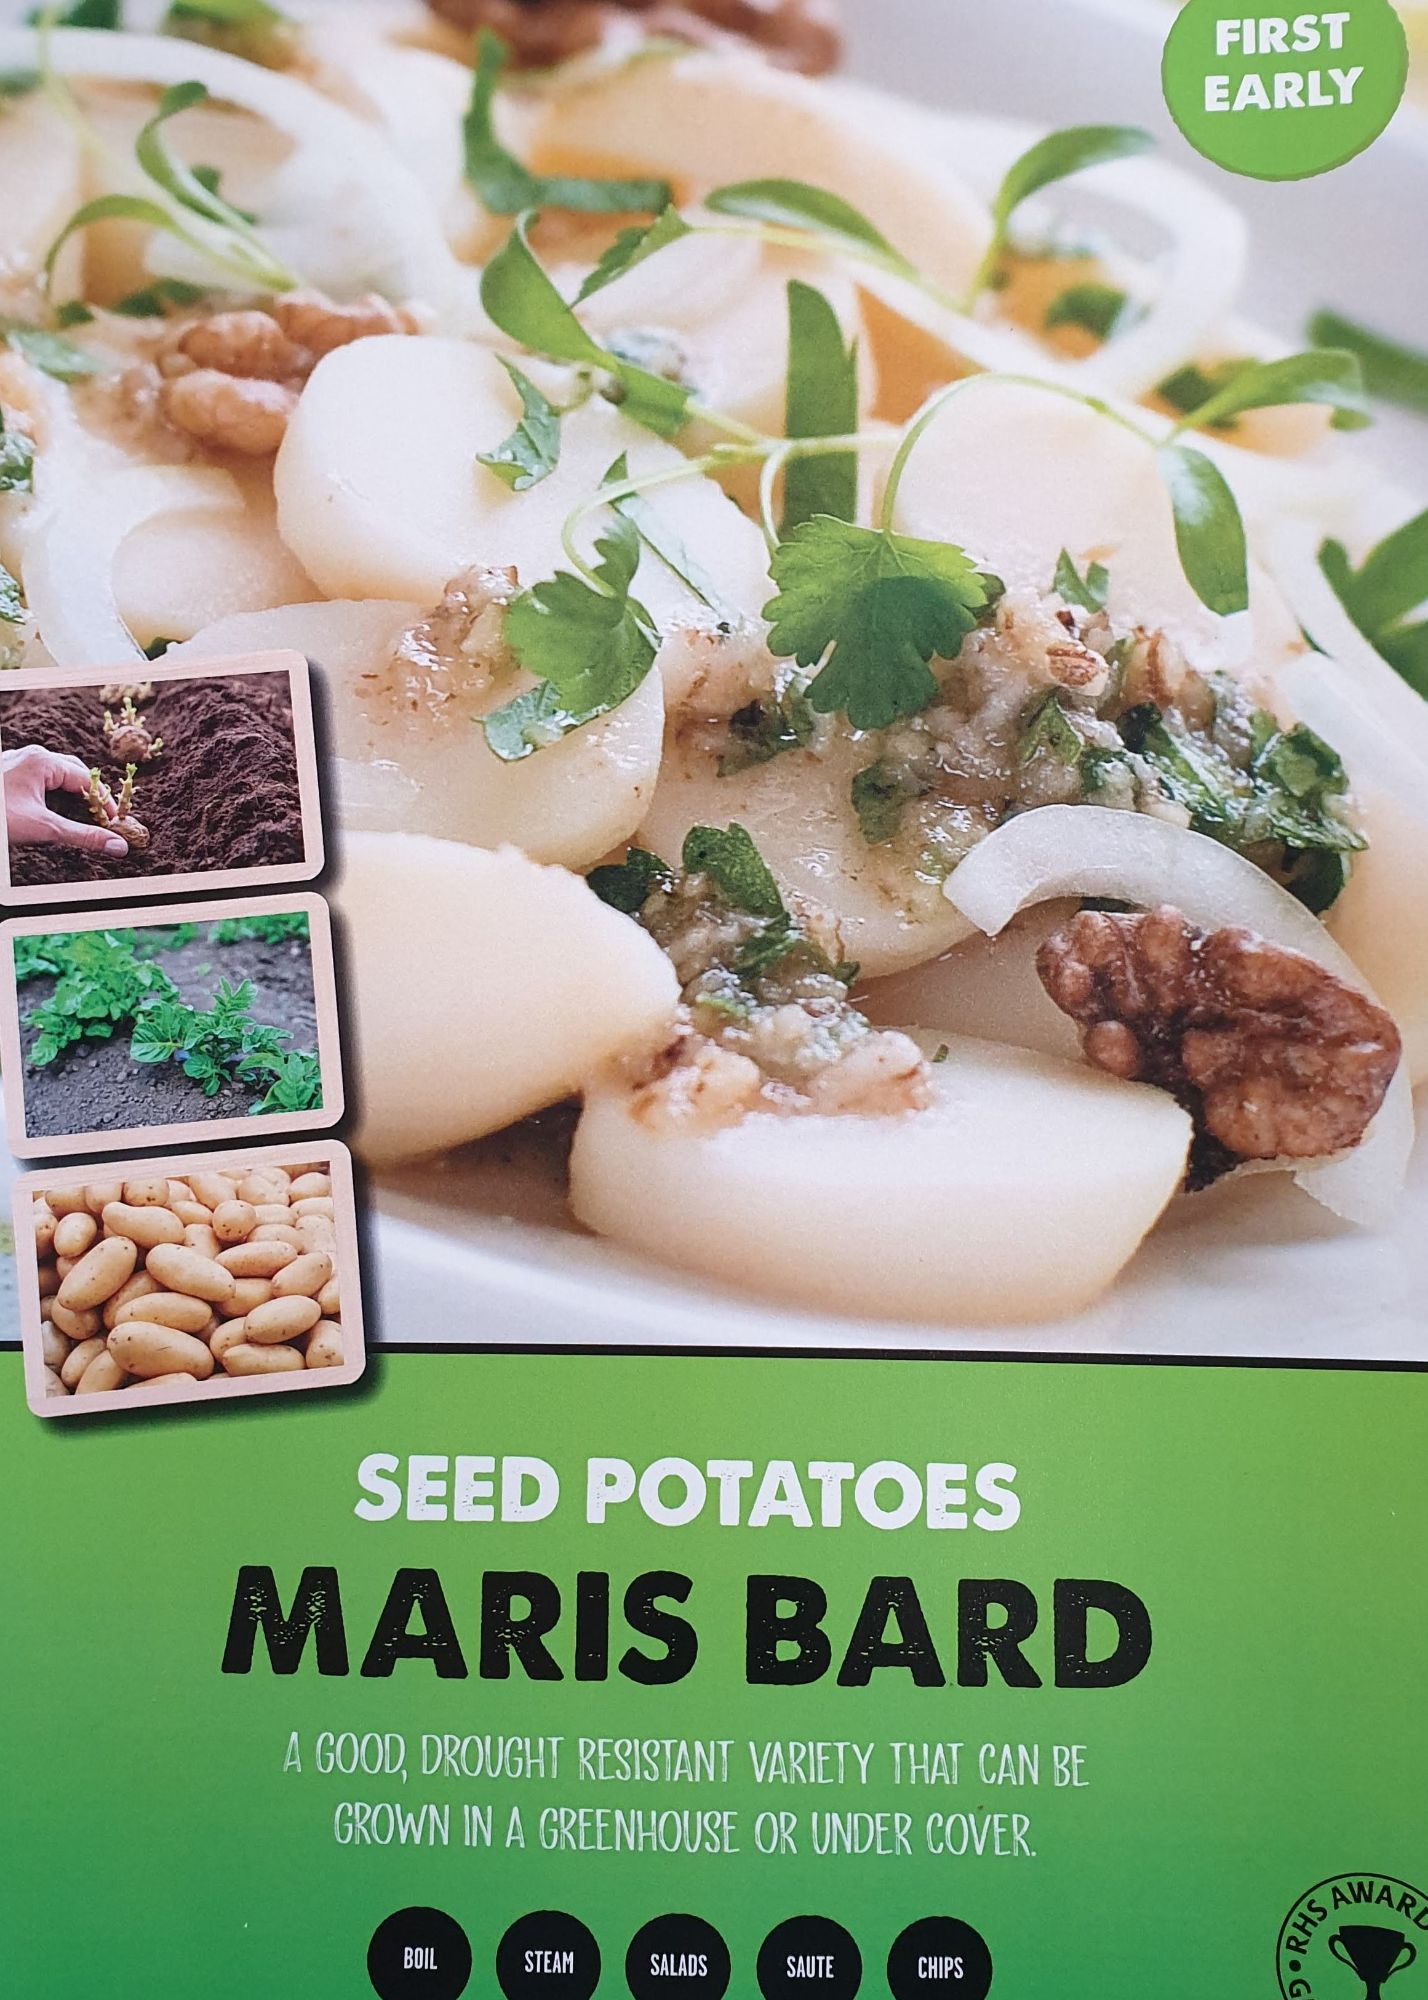 maris_bard_seed_potato_info.jpg